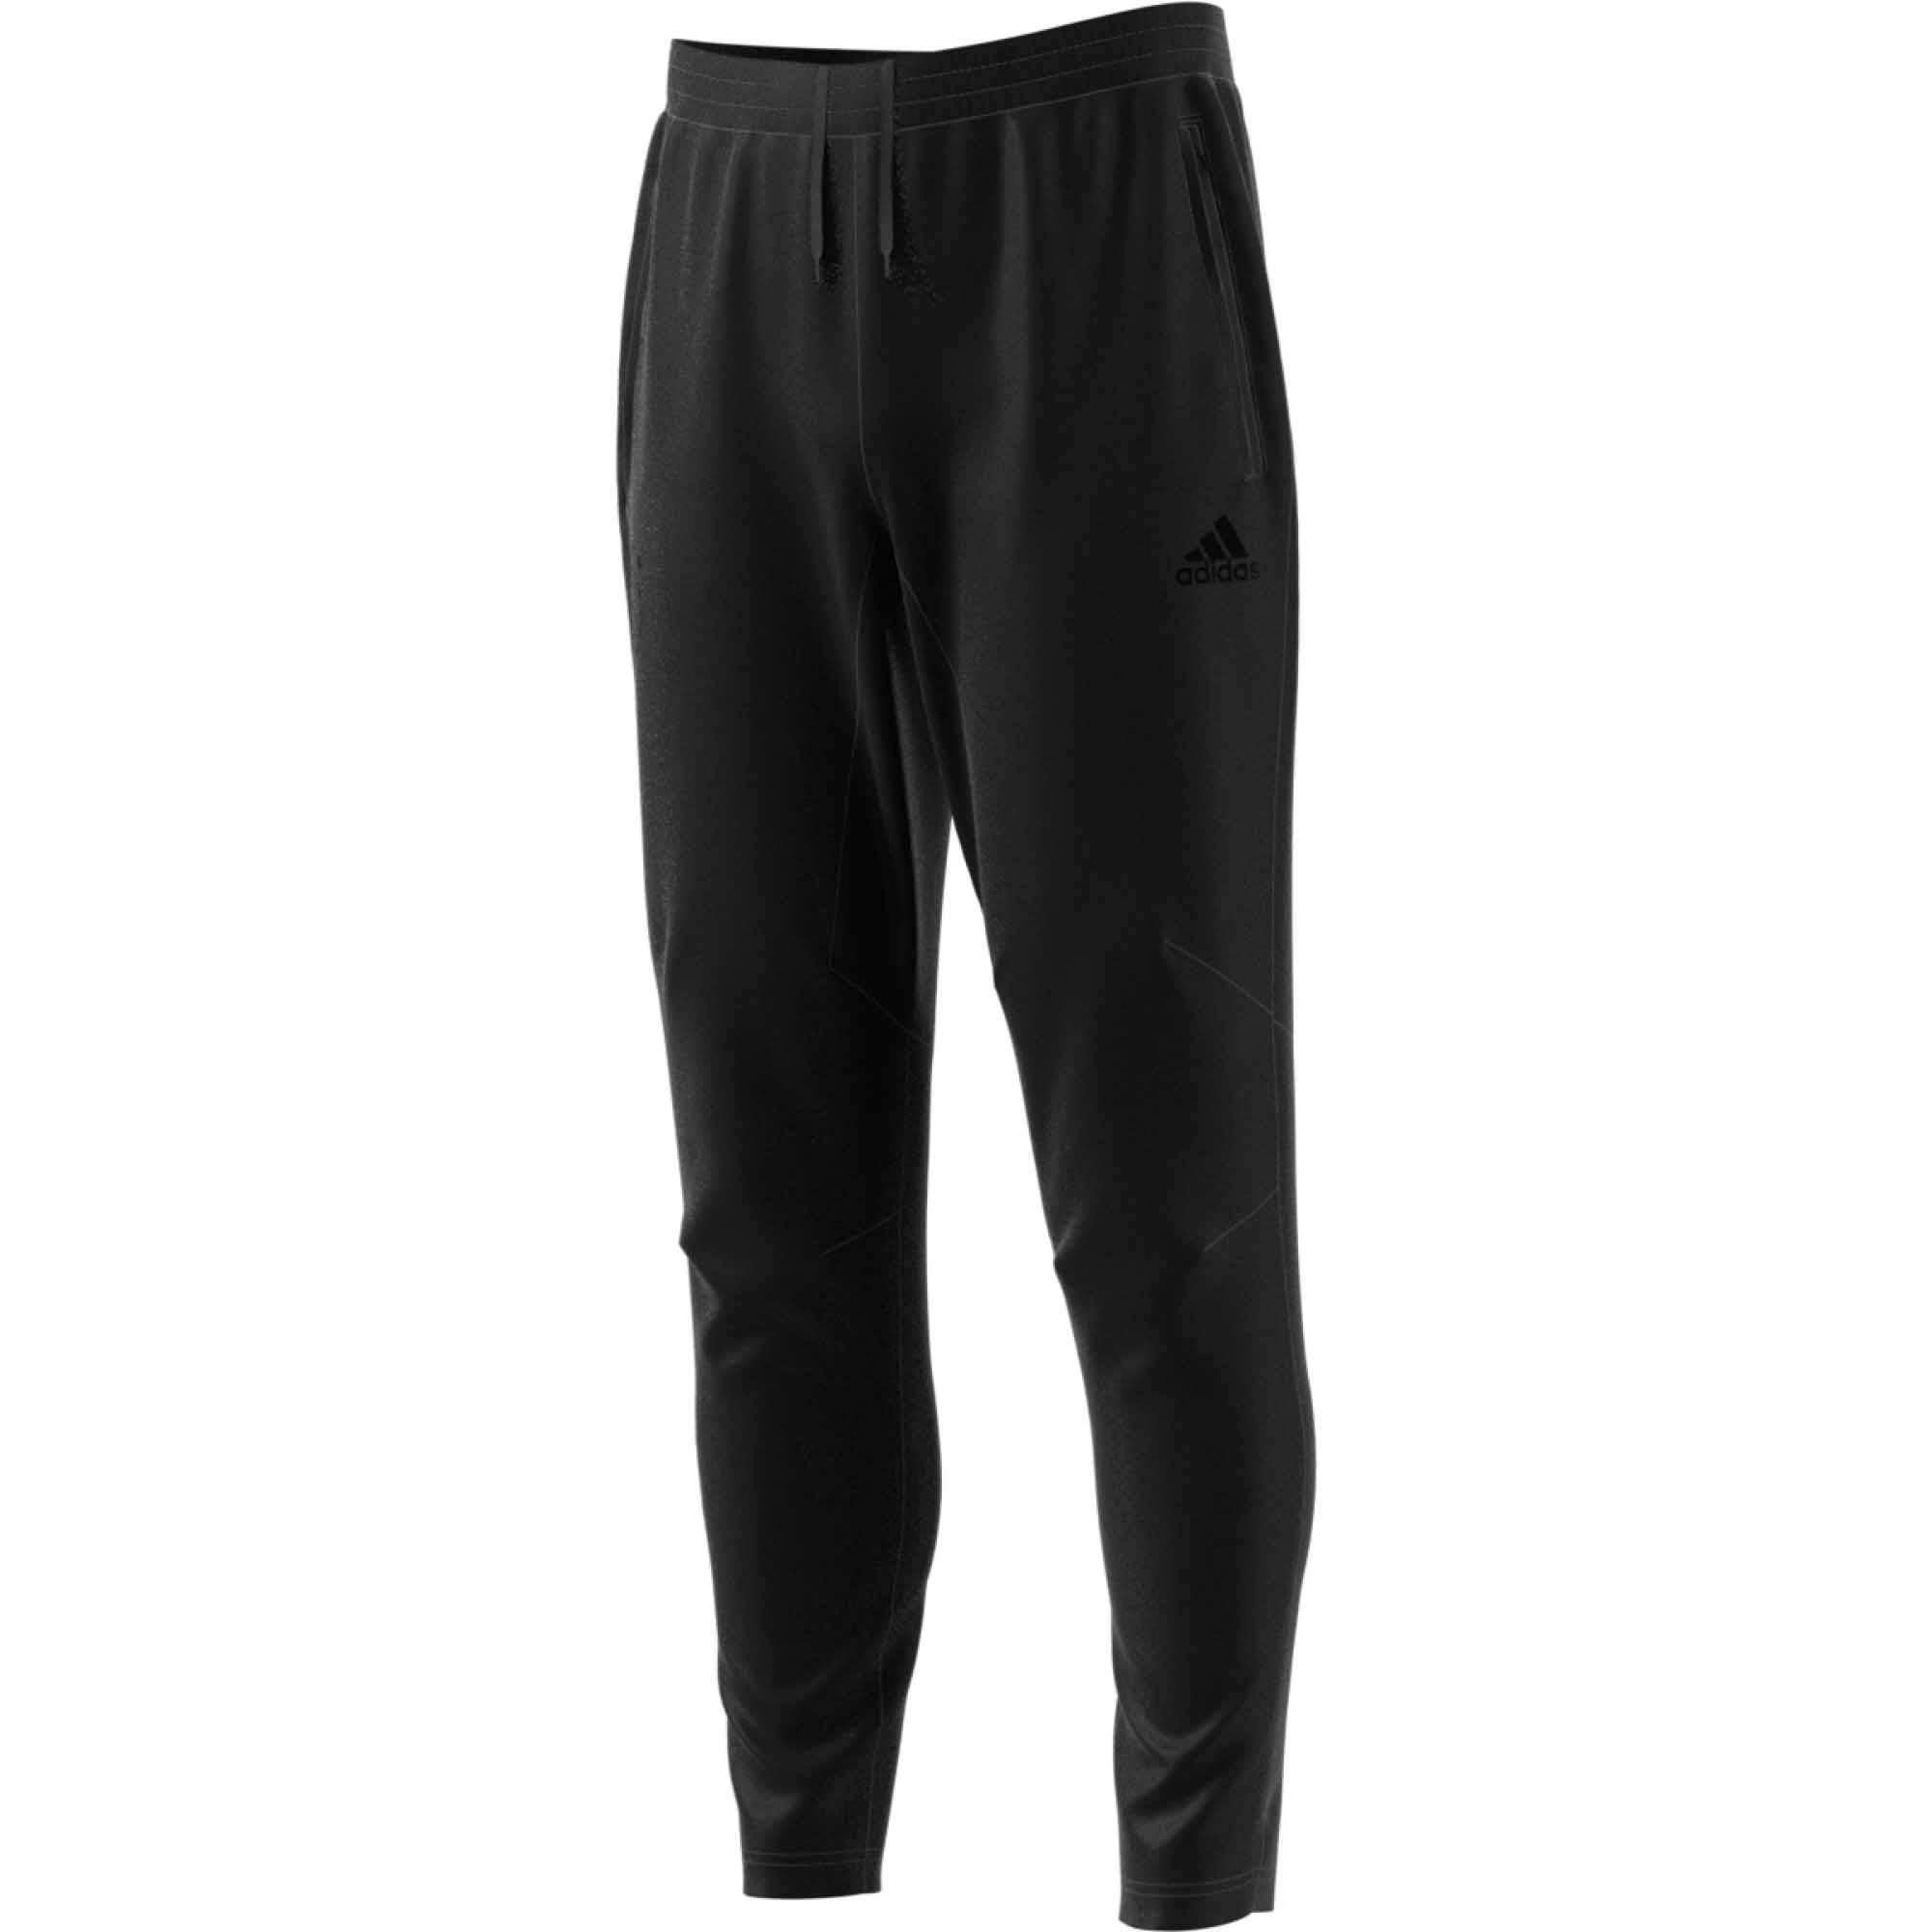 655c3934f529 adidas Germany Low Crotch Pants - Black - SoccerPro